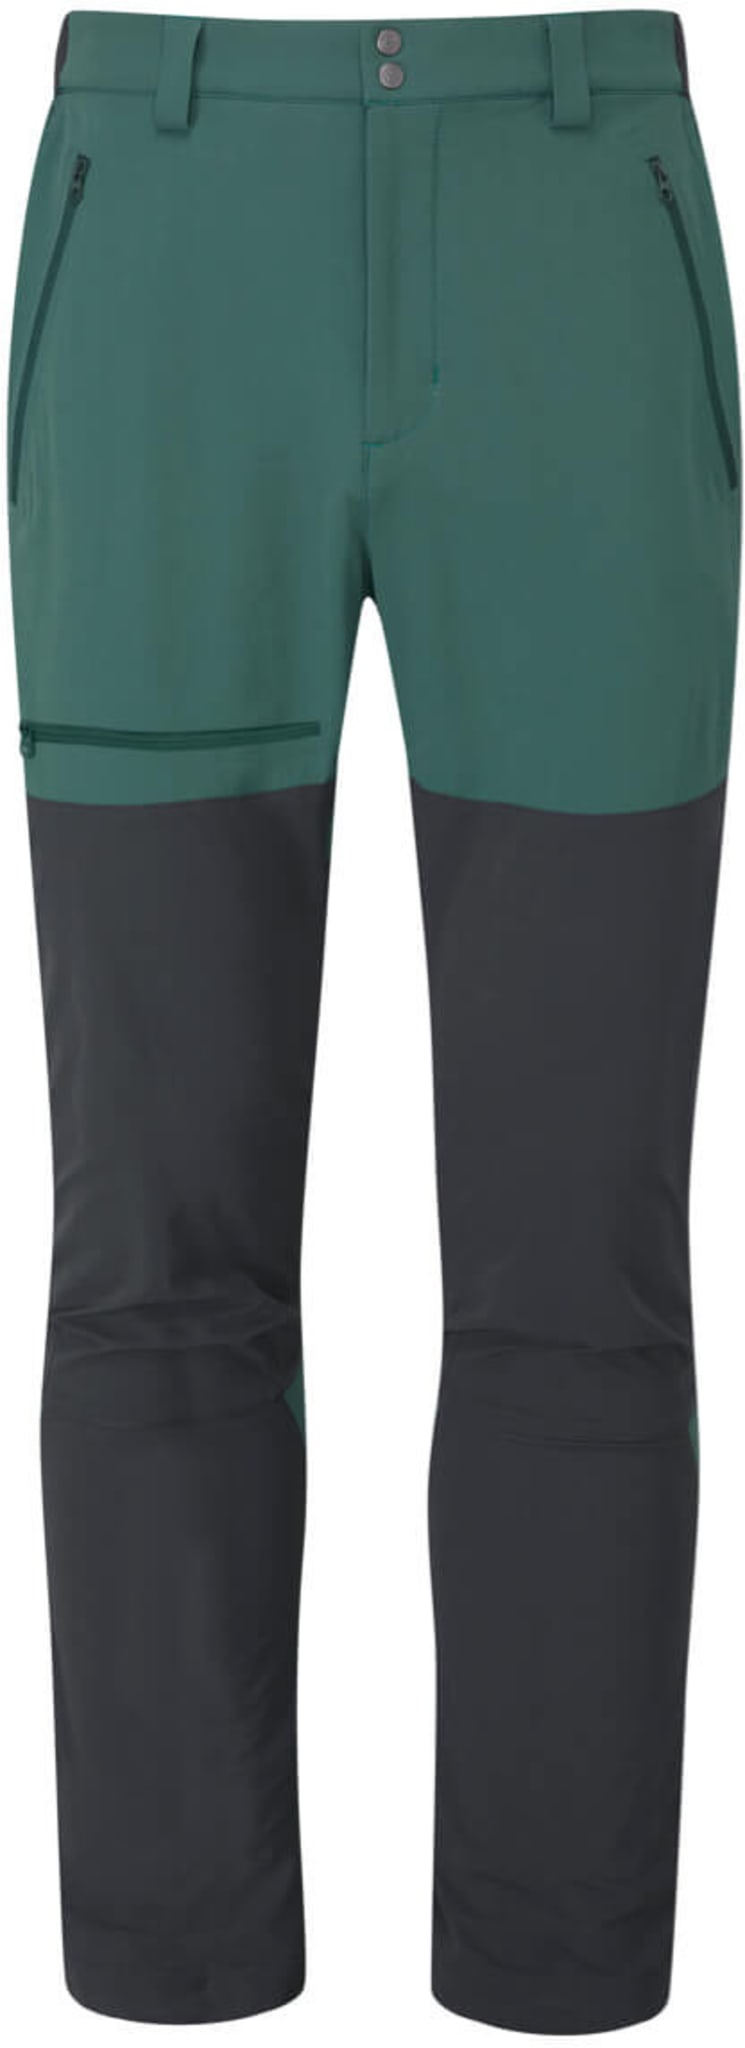 Torque Mountain Pants Ms